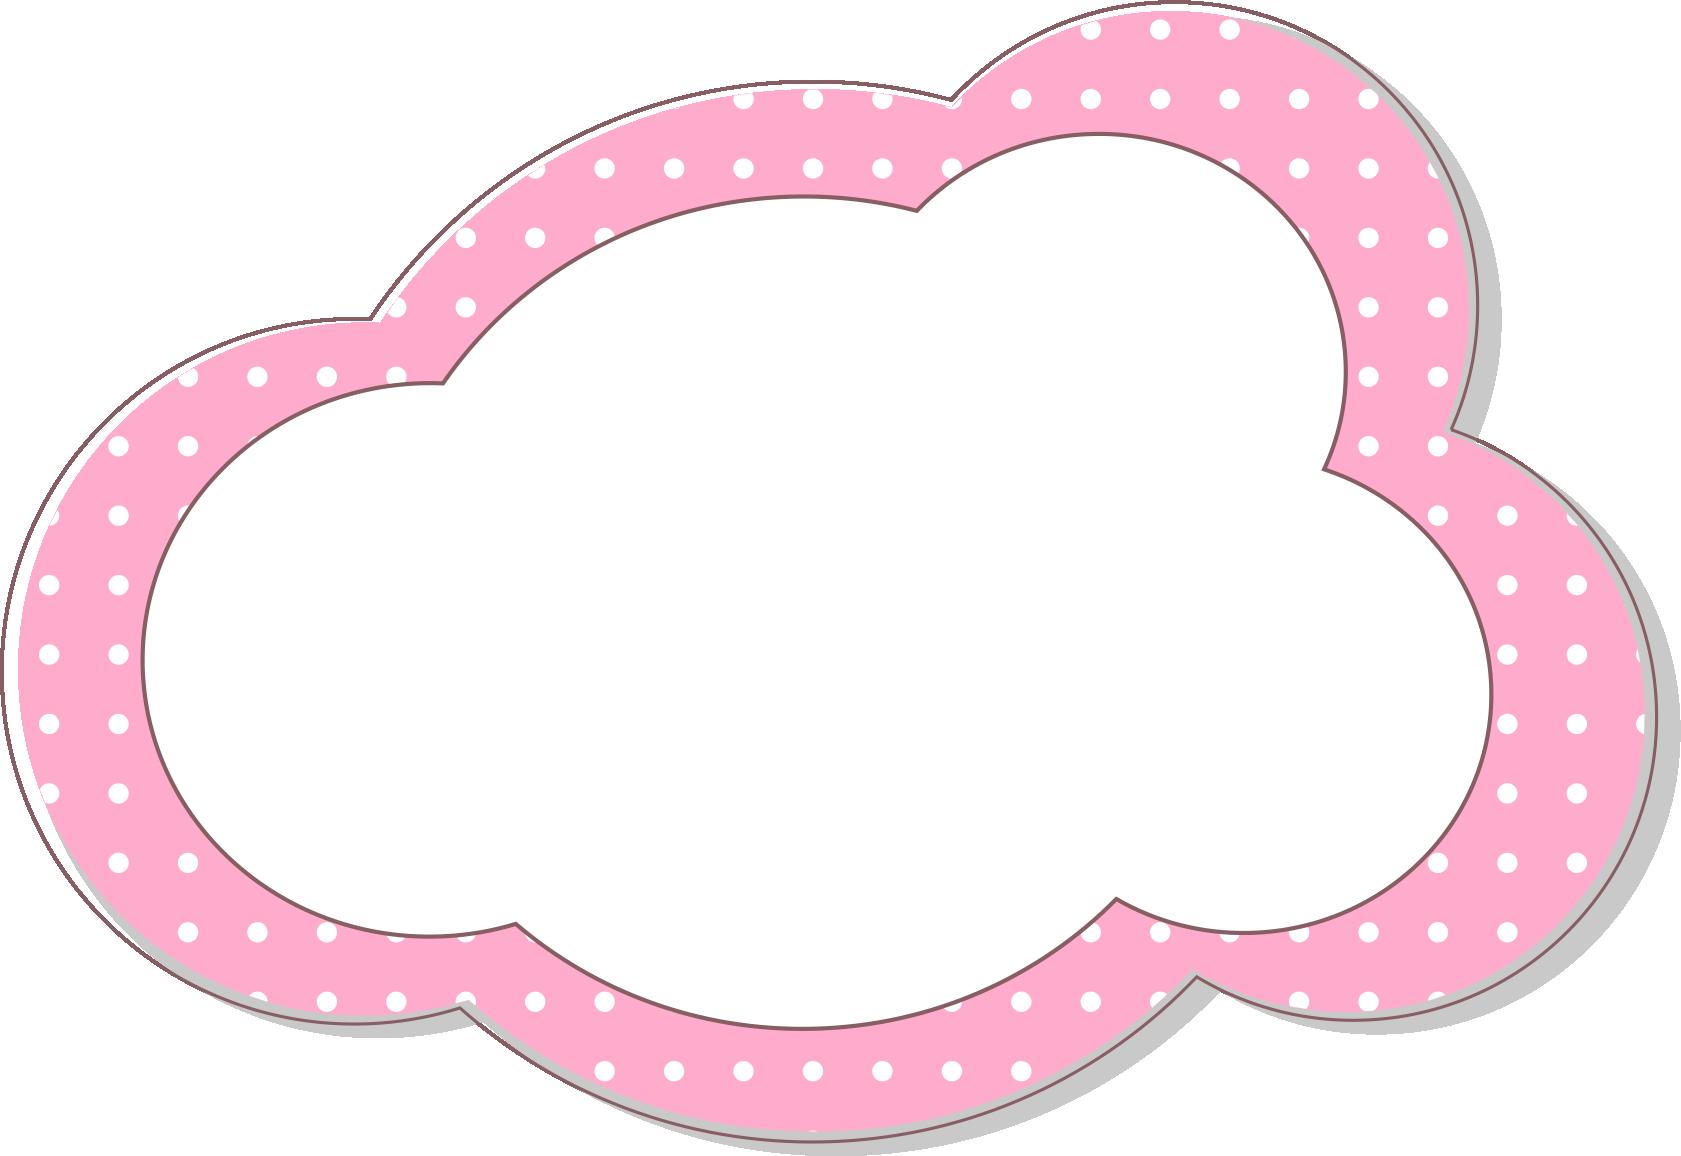 Adobe illustrator computer file. Cloud border png